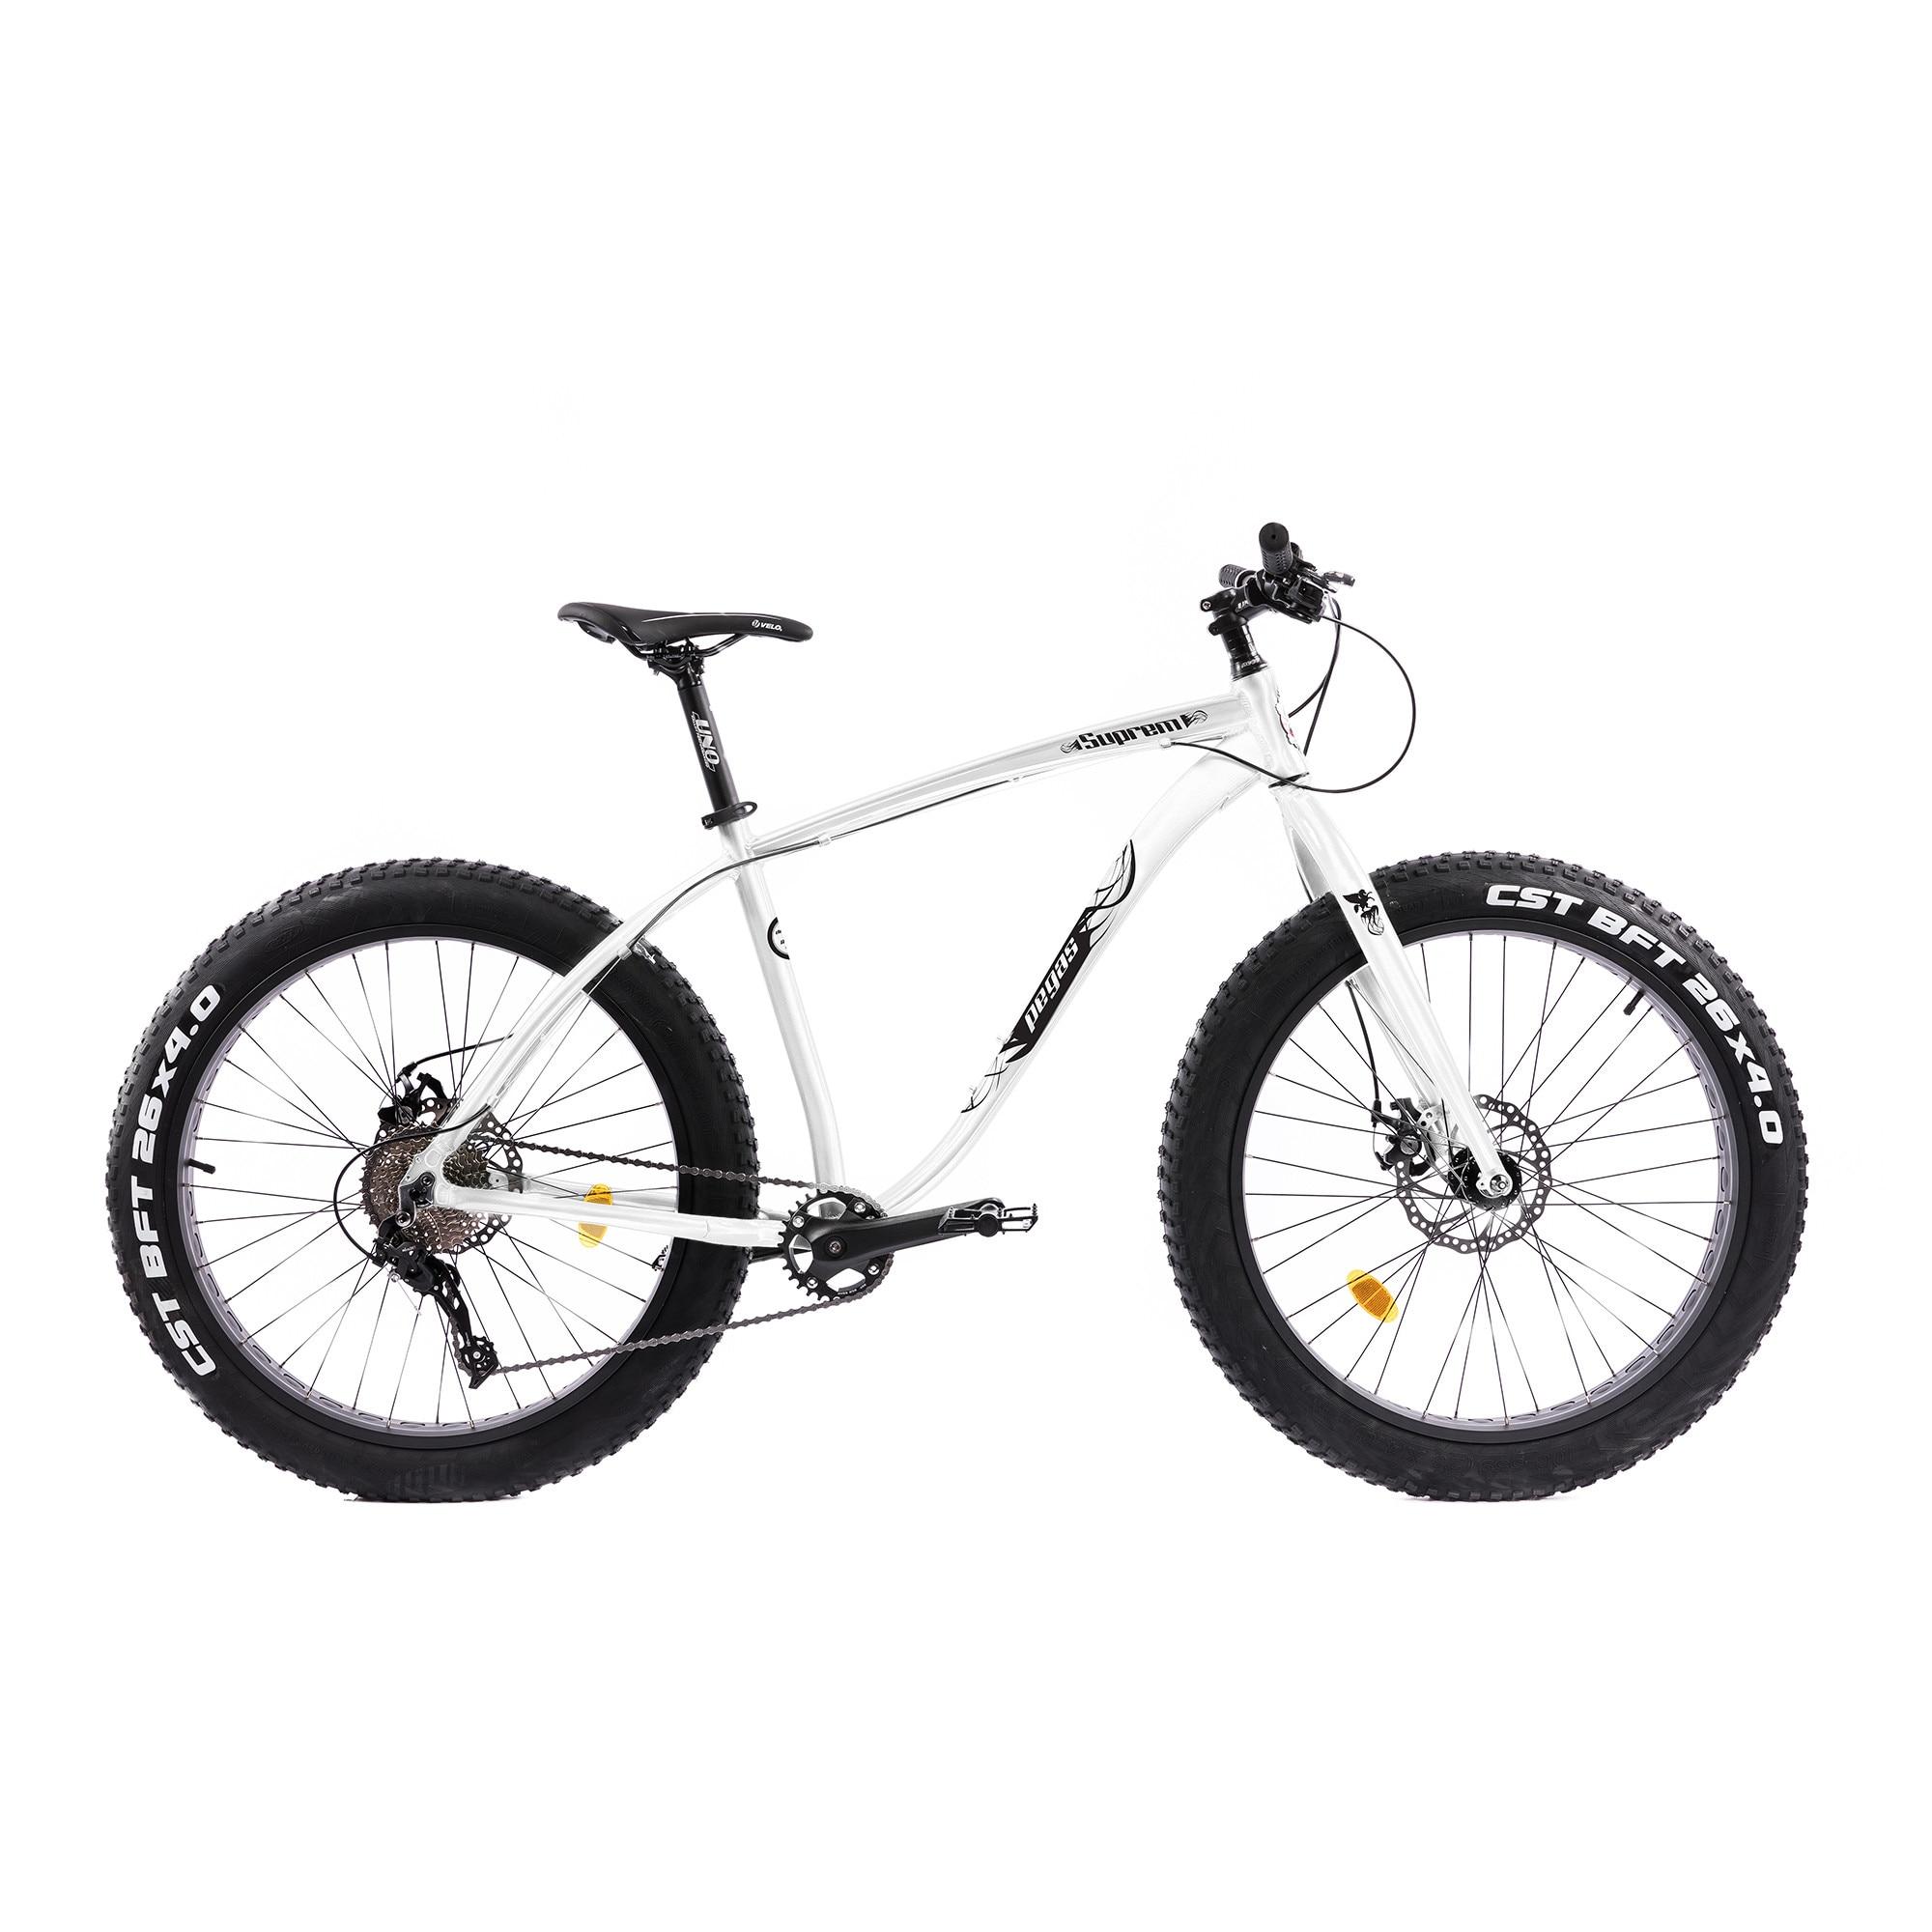 "Fotografie Bicicleta Pegas Fat Bike Suprem Fx 17"" 10s, Alb Perlat"